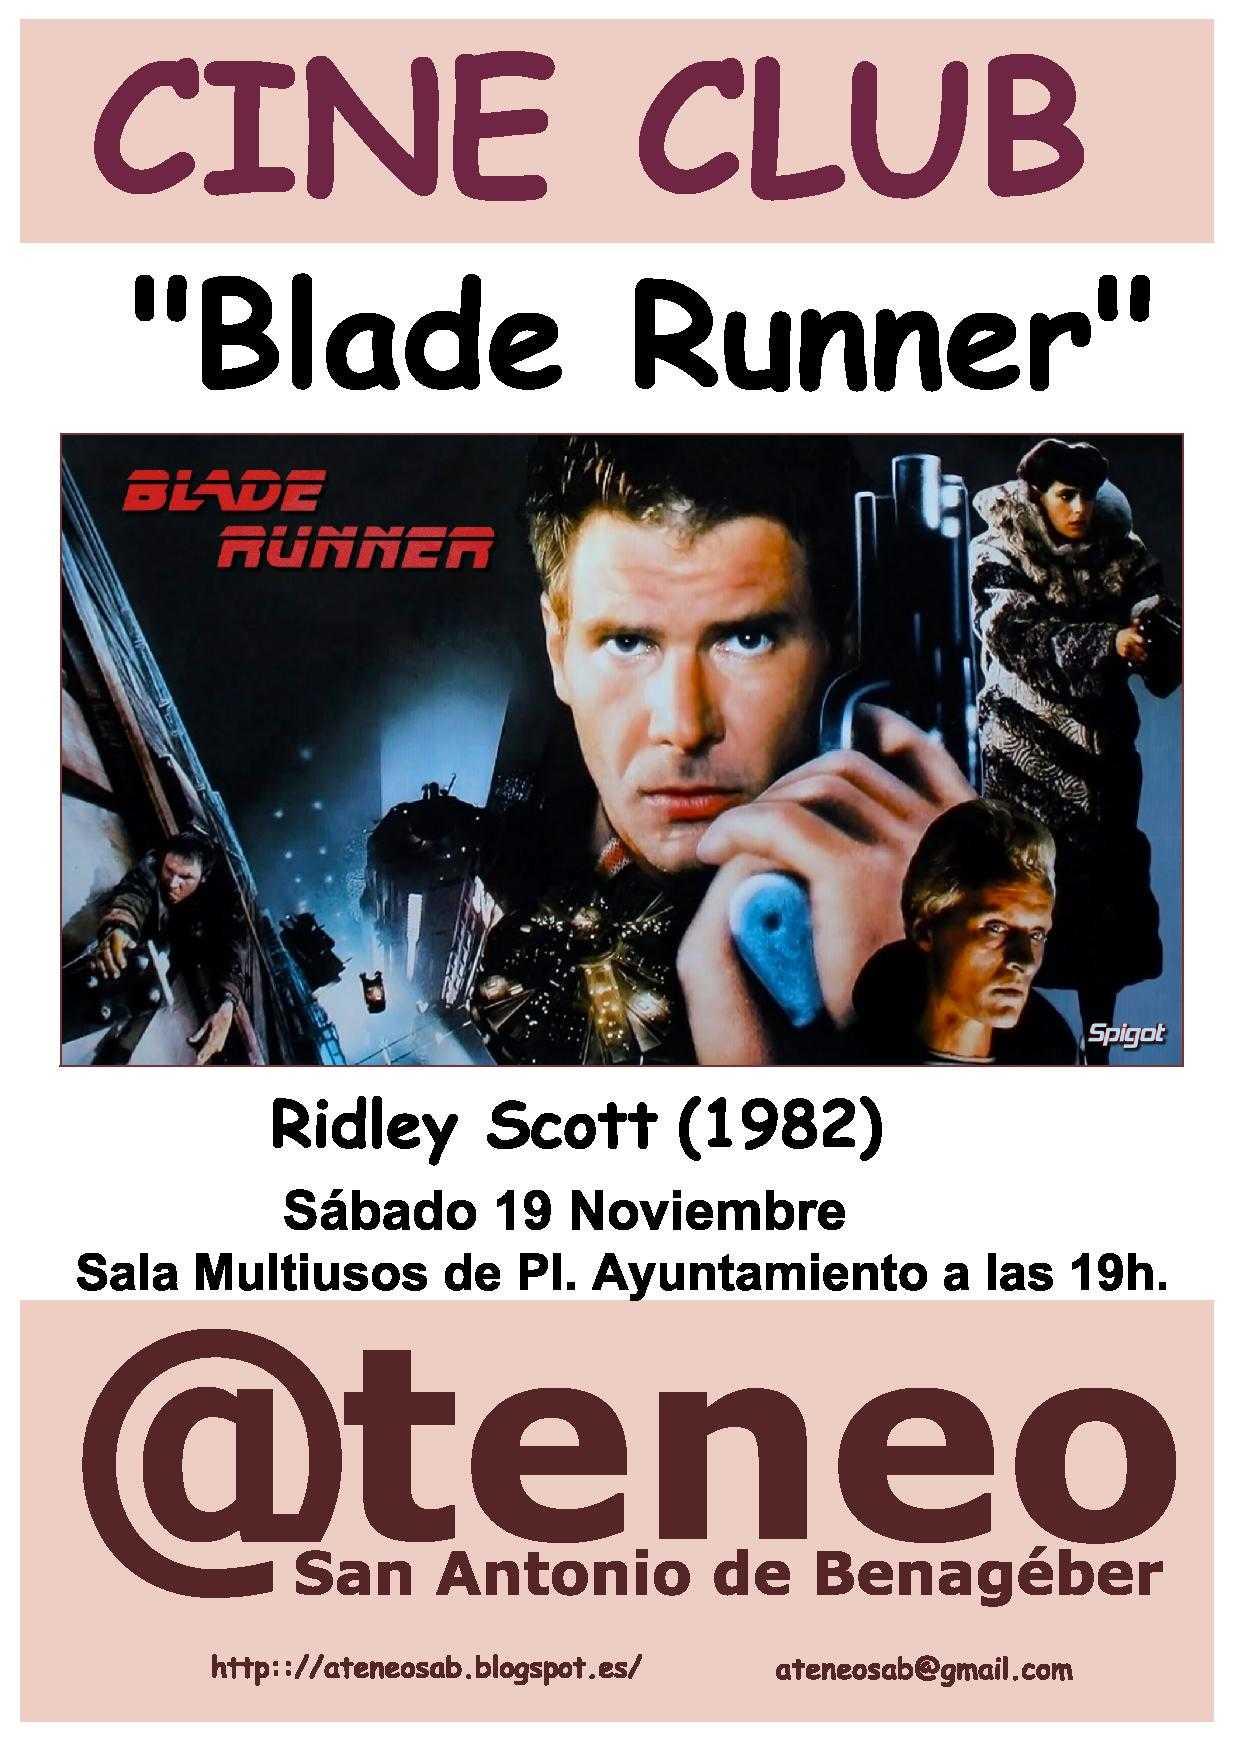 cineclub-blade-runner-a4